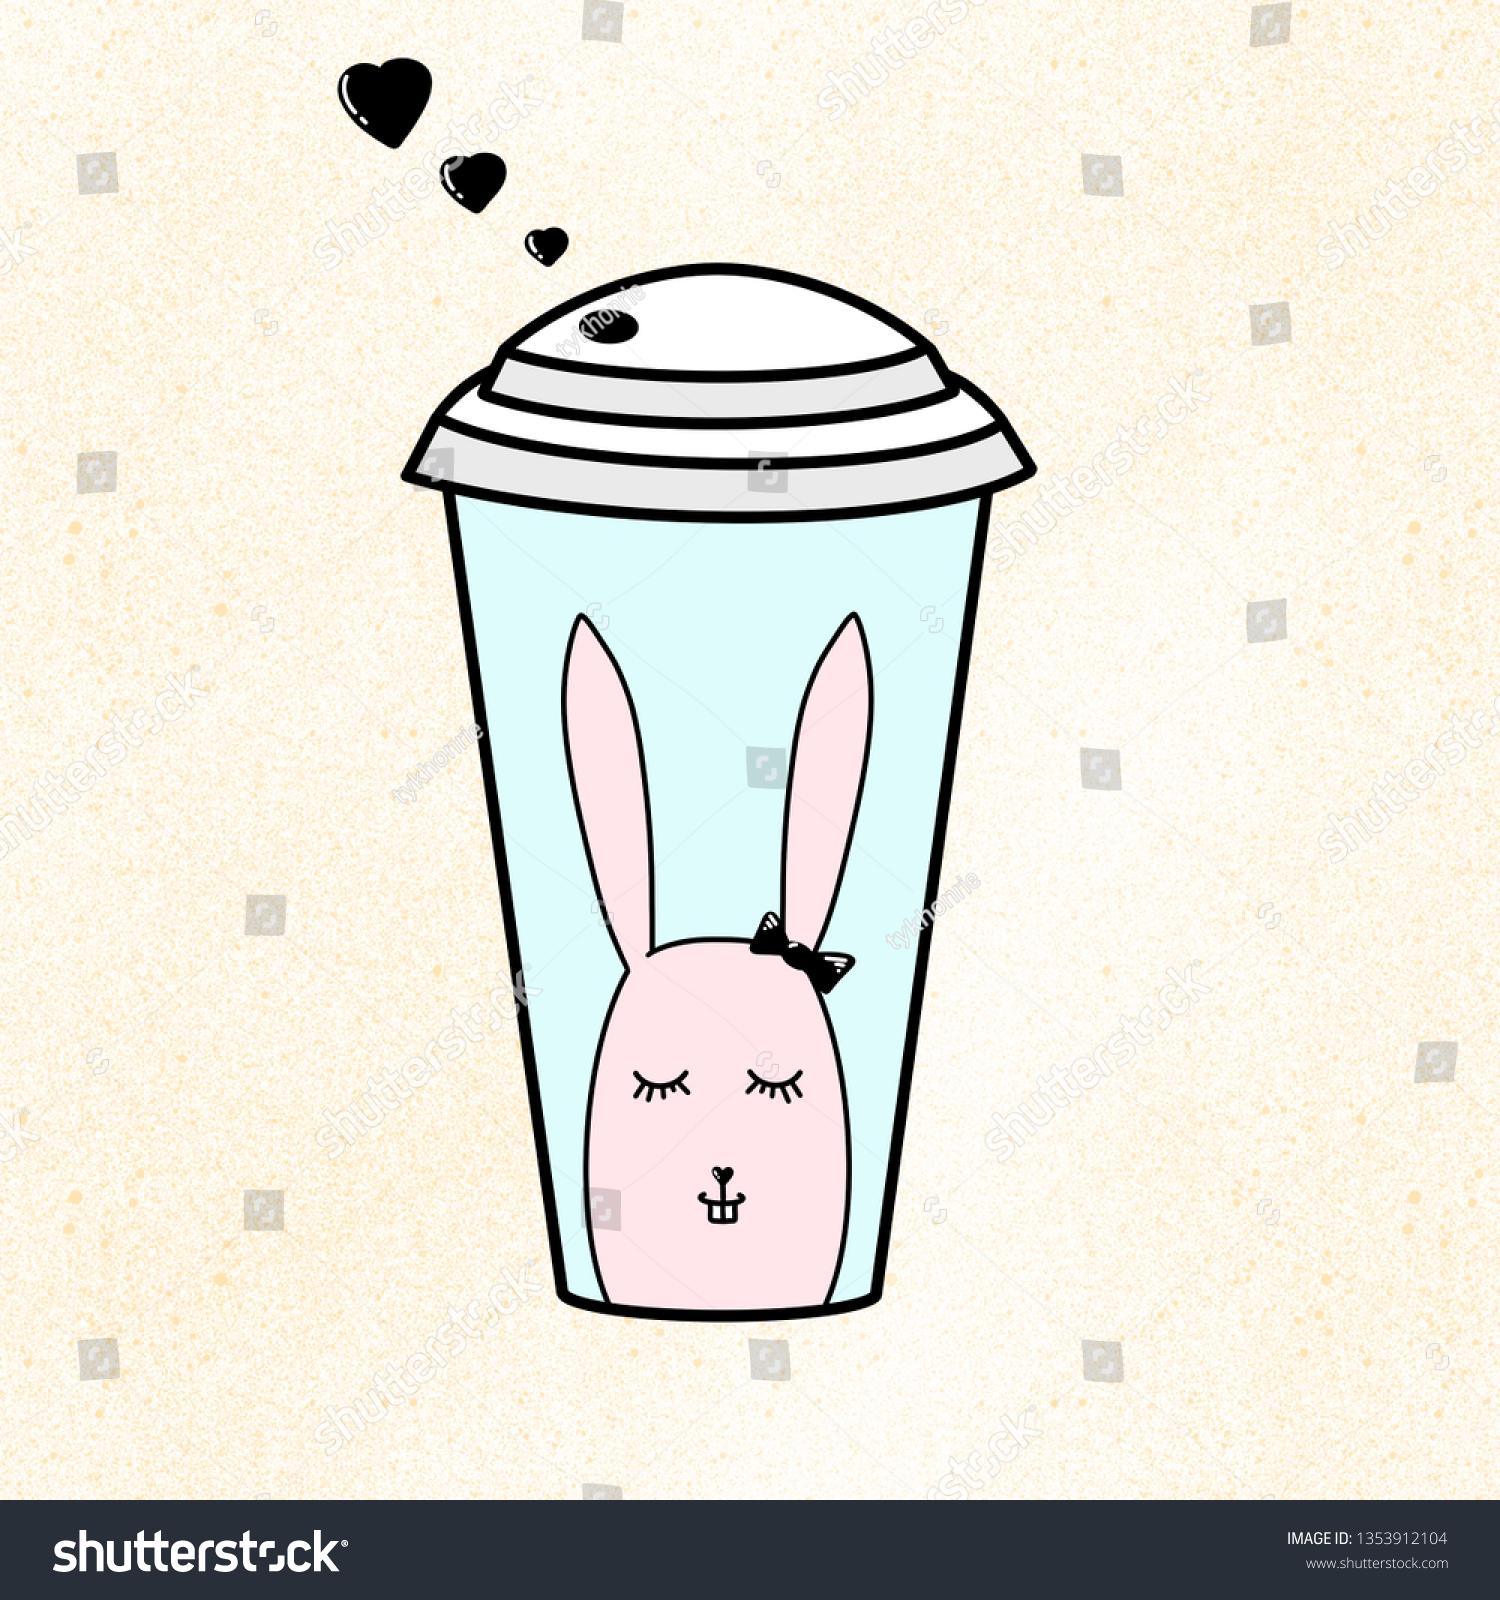 stock-photo-plastic-coffee-juice-or-tea-